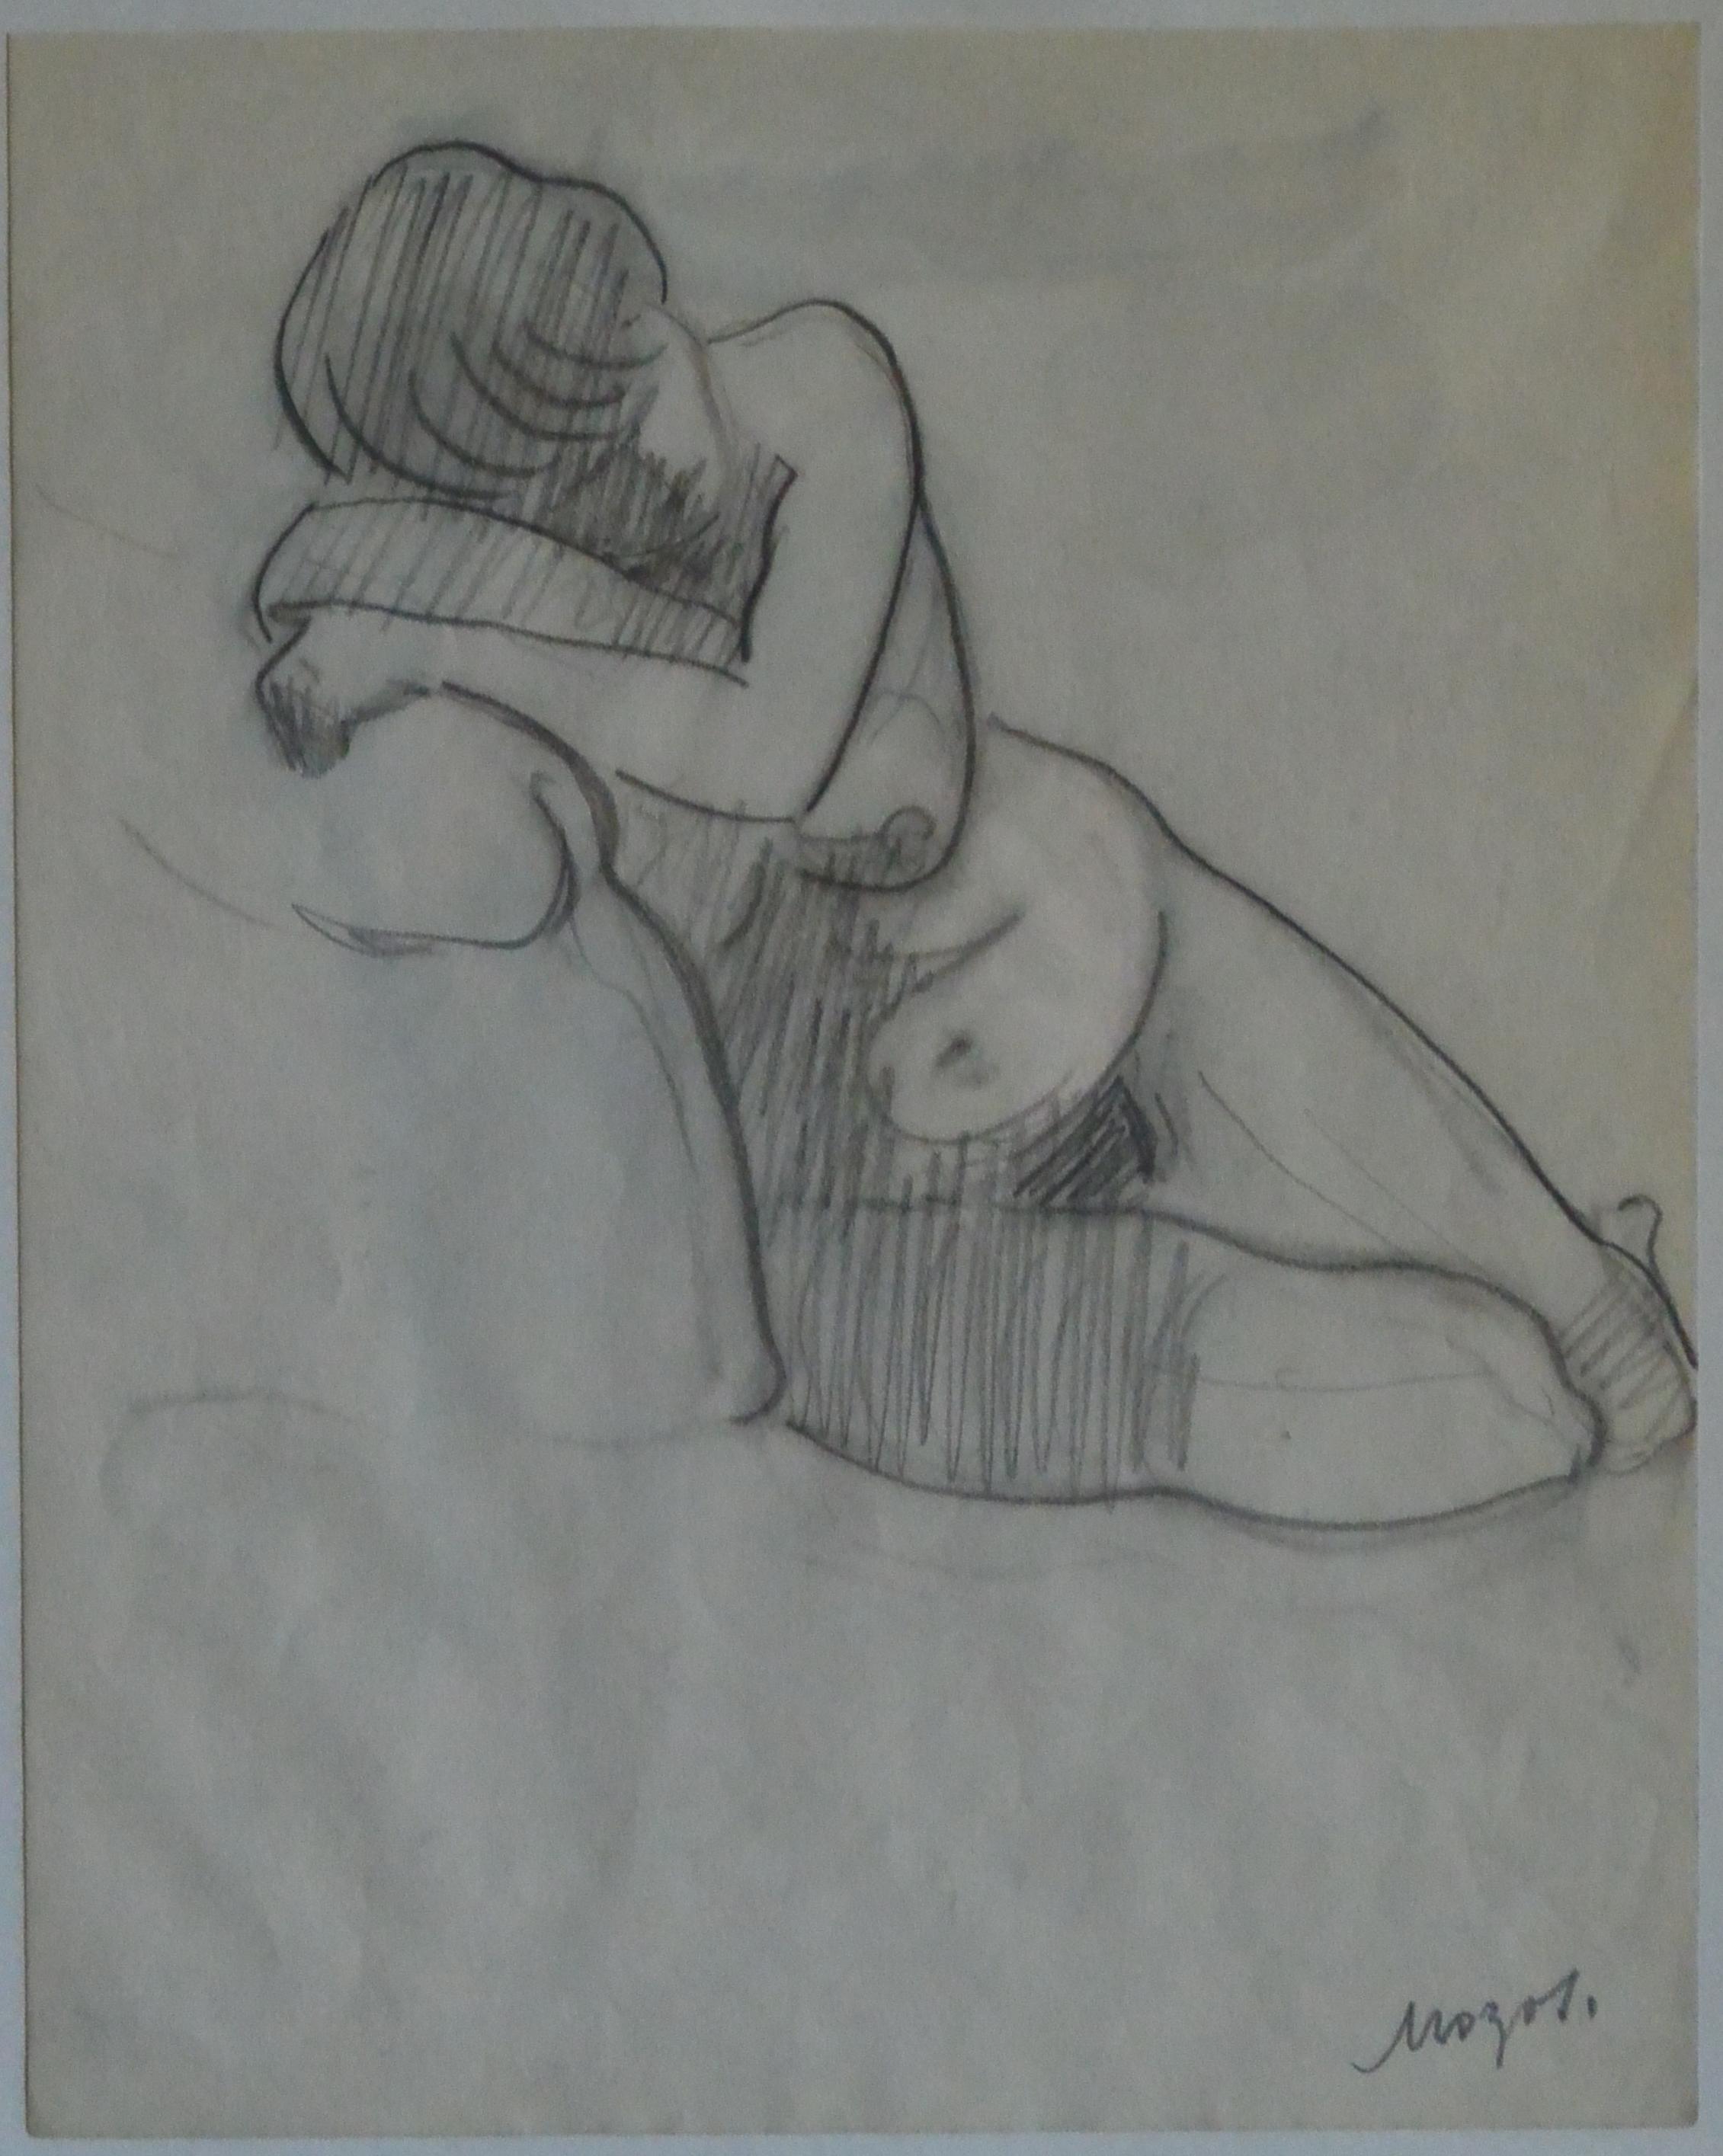 Pedro Mozos Mujer Desnuda Recostada Dibujo Lápiz